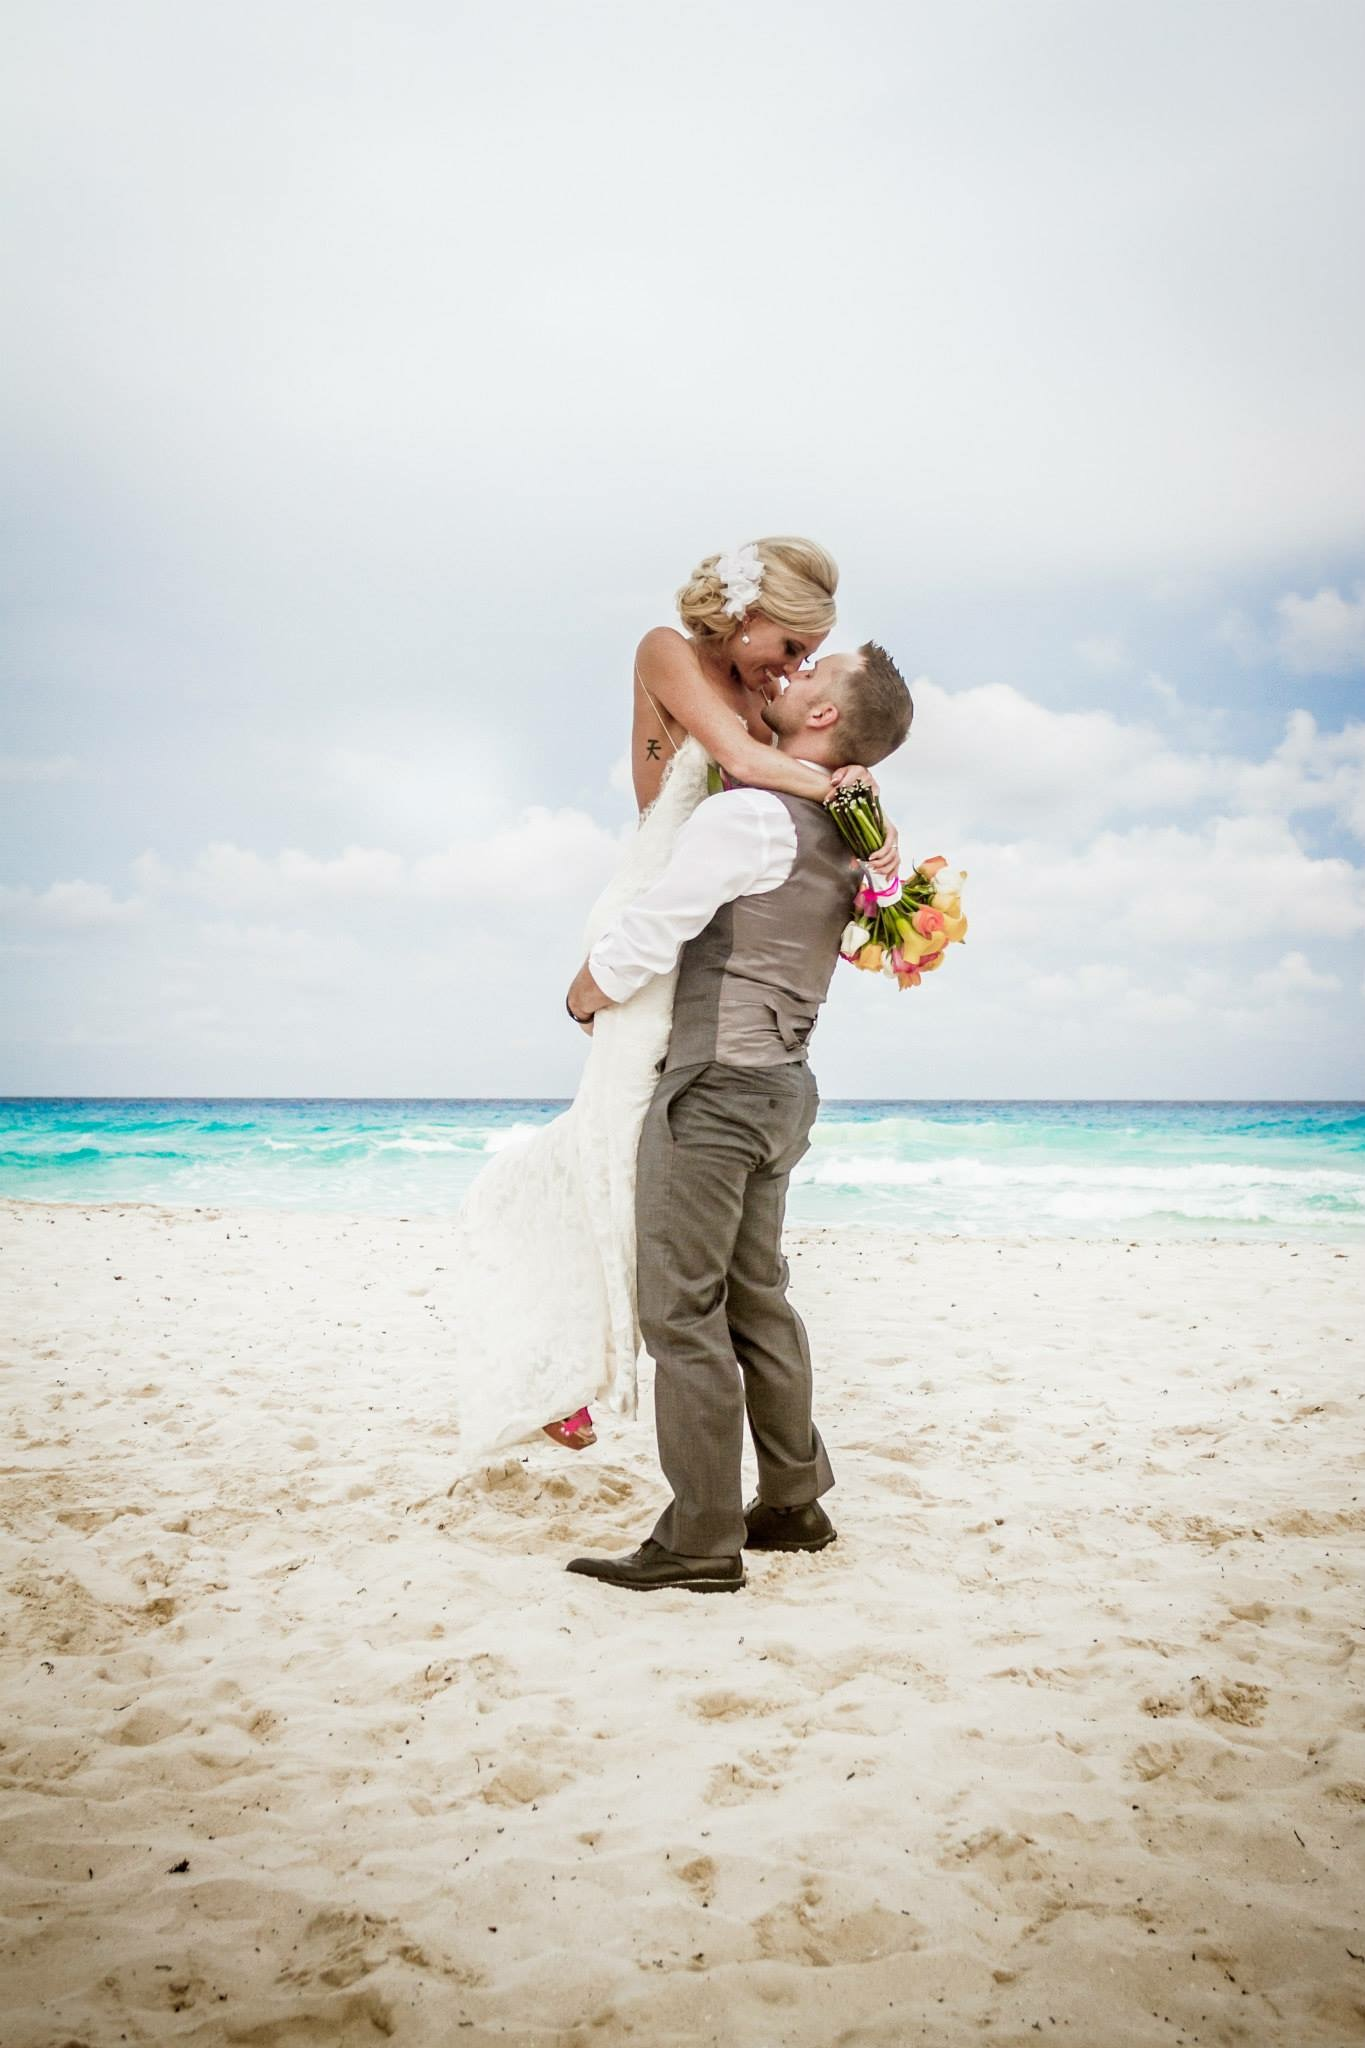 krysten-reed-cancun-beach-wedding-22.JPG